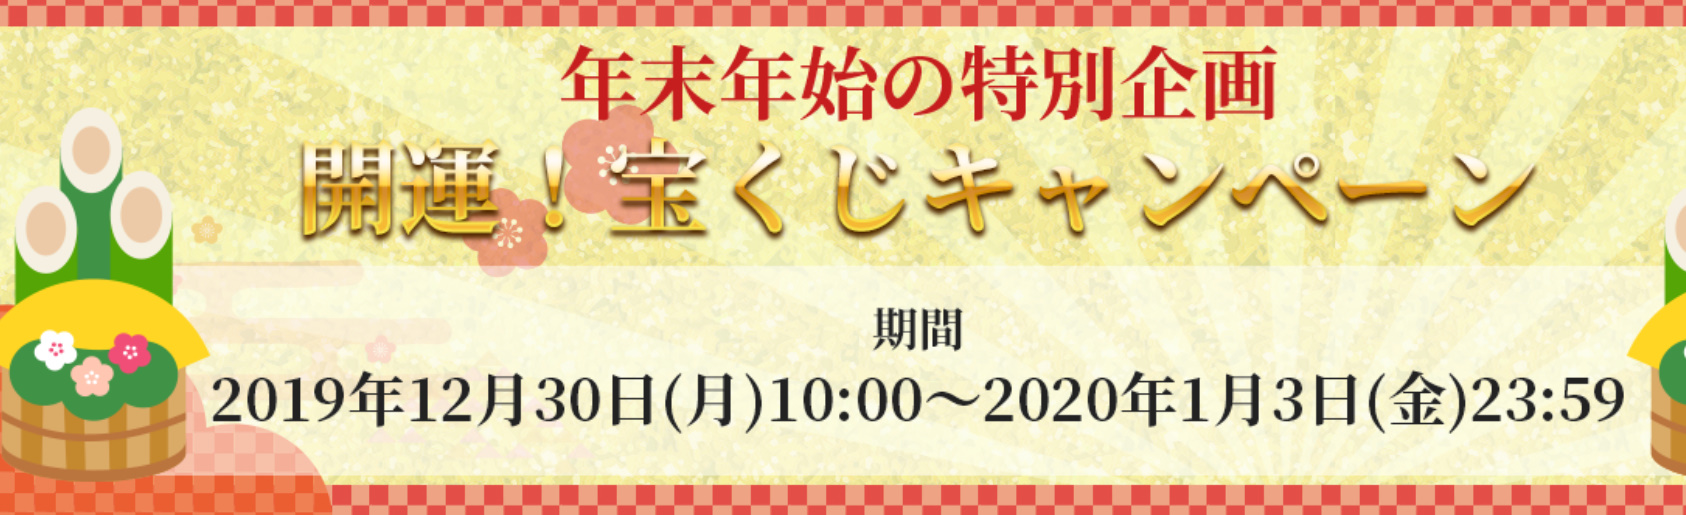 is6com2020年お年玉キャンペーン